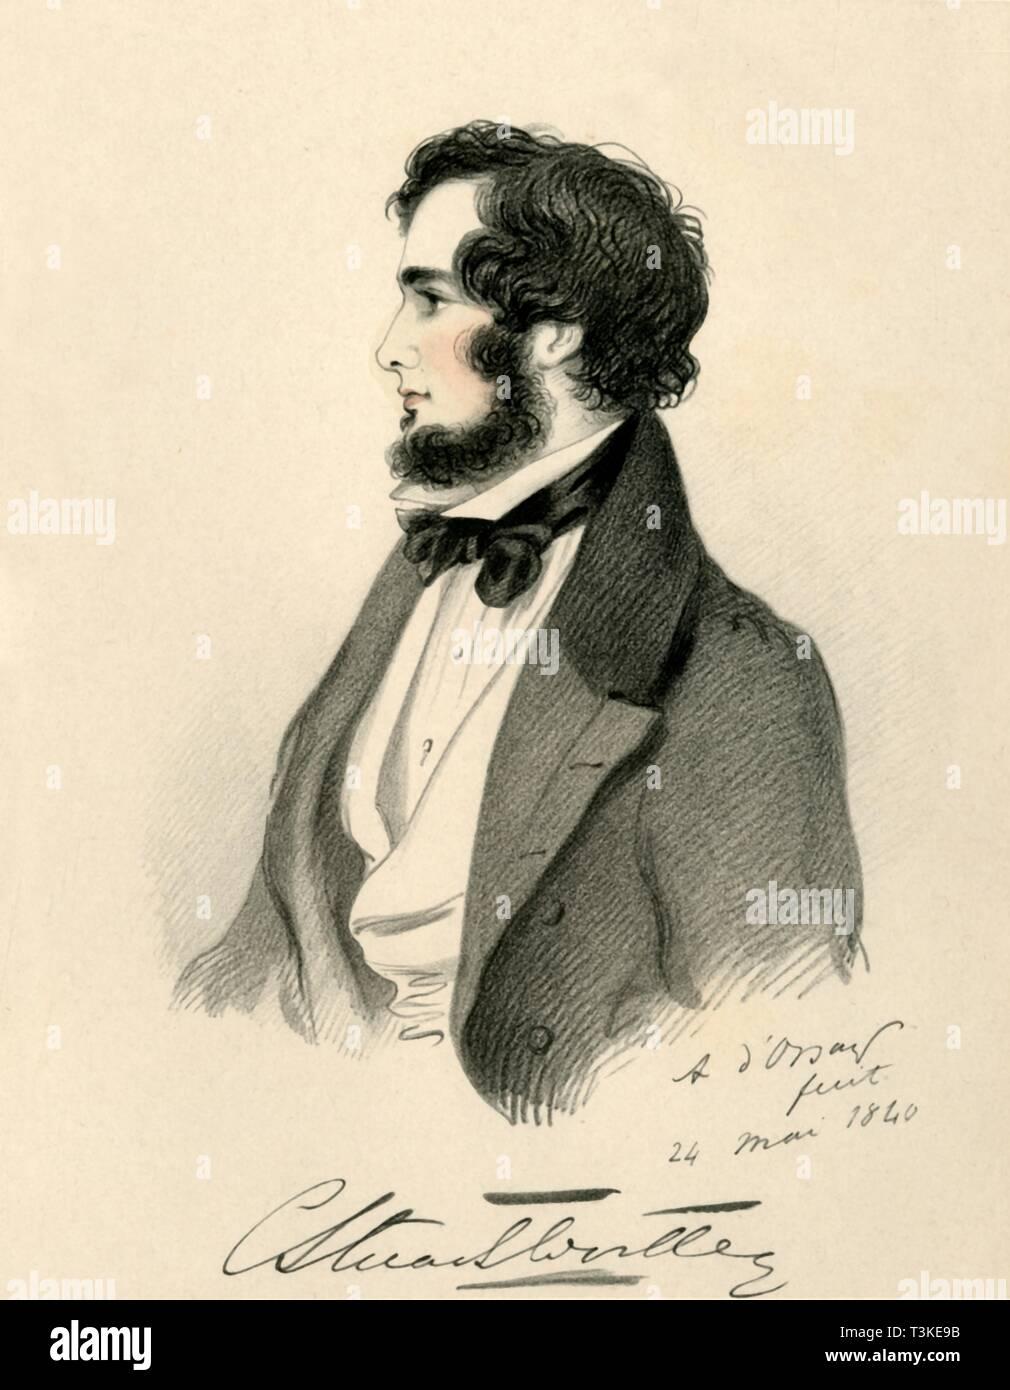 'Charles Stuart Wortley', 1840. Creator: Richard James Lane. - Stock Image